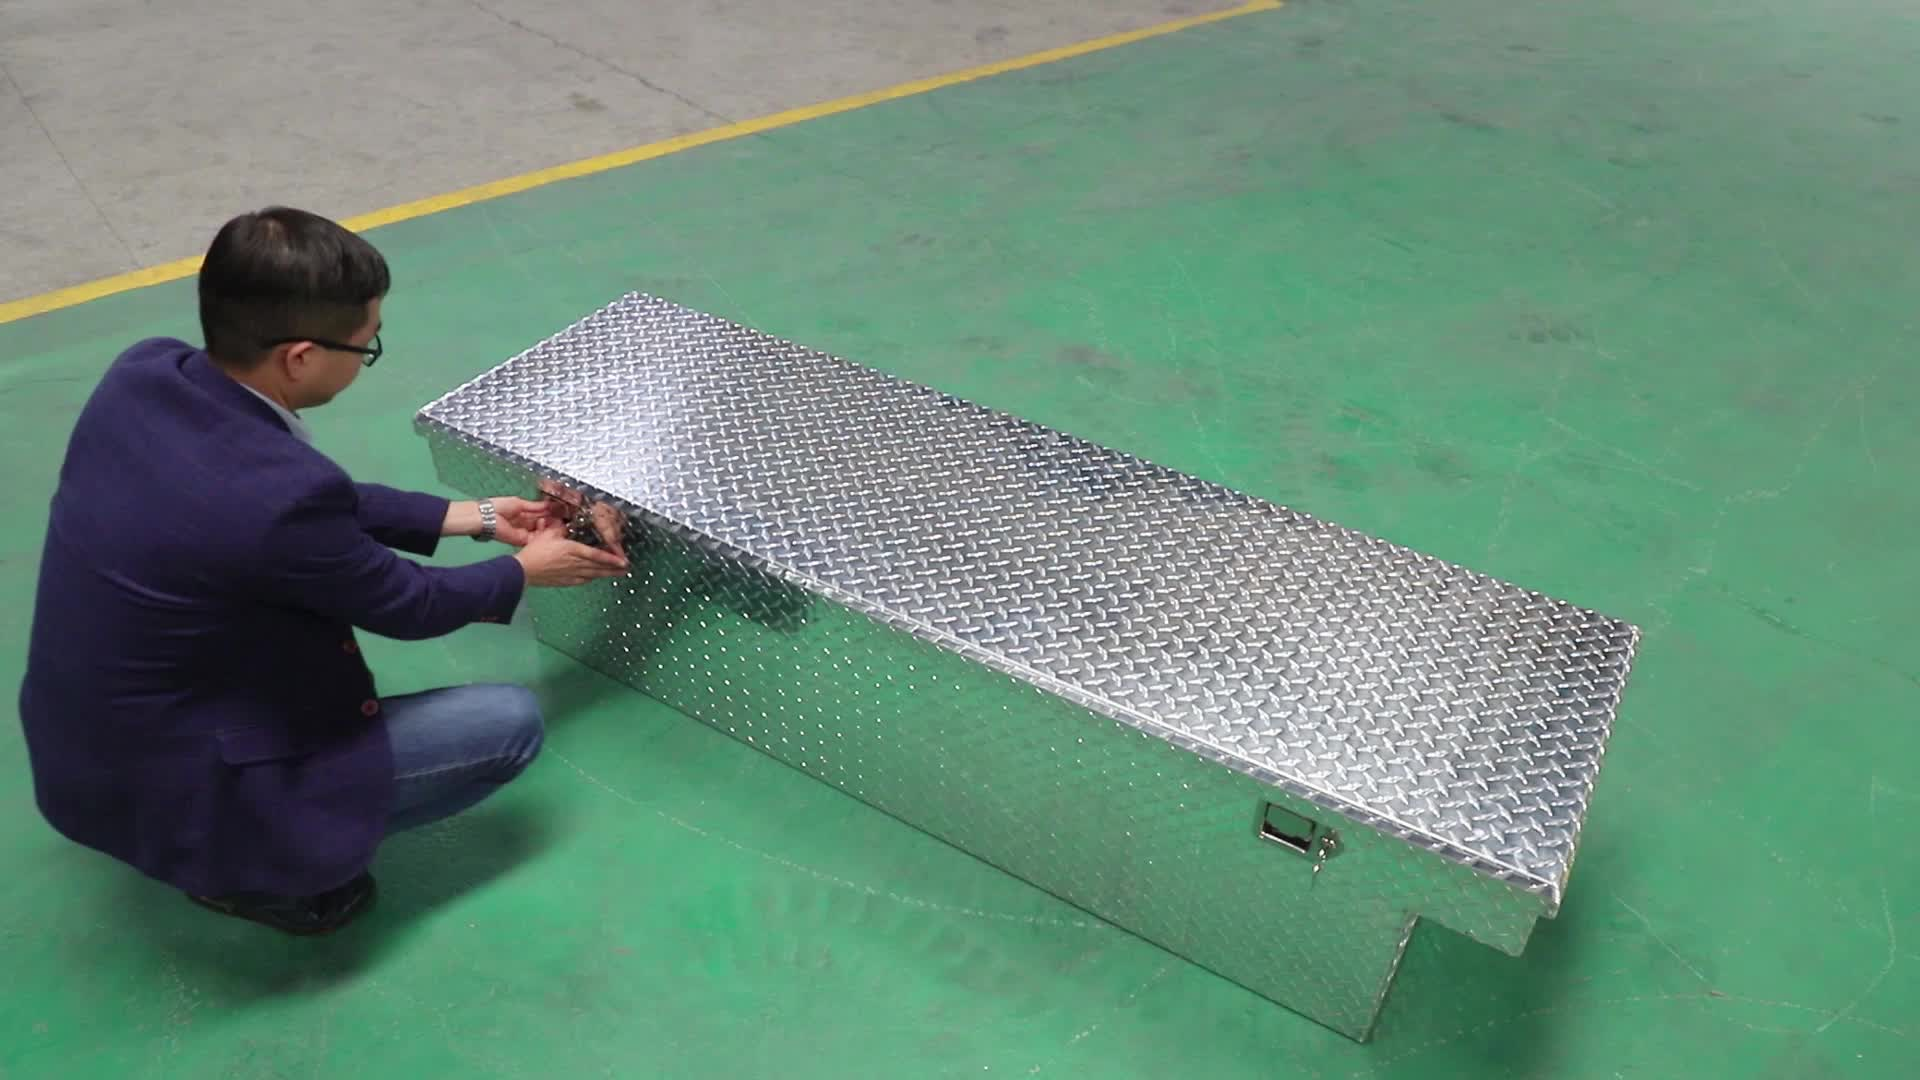 "72"" US general aluminum crossover pickup bed tool box"